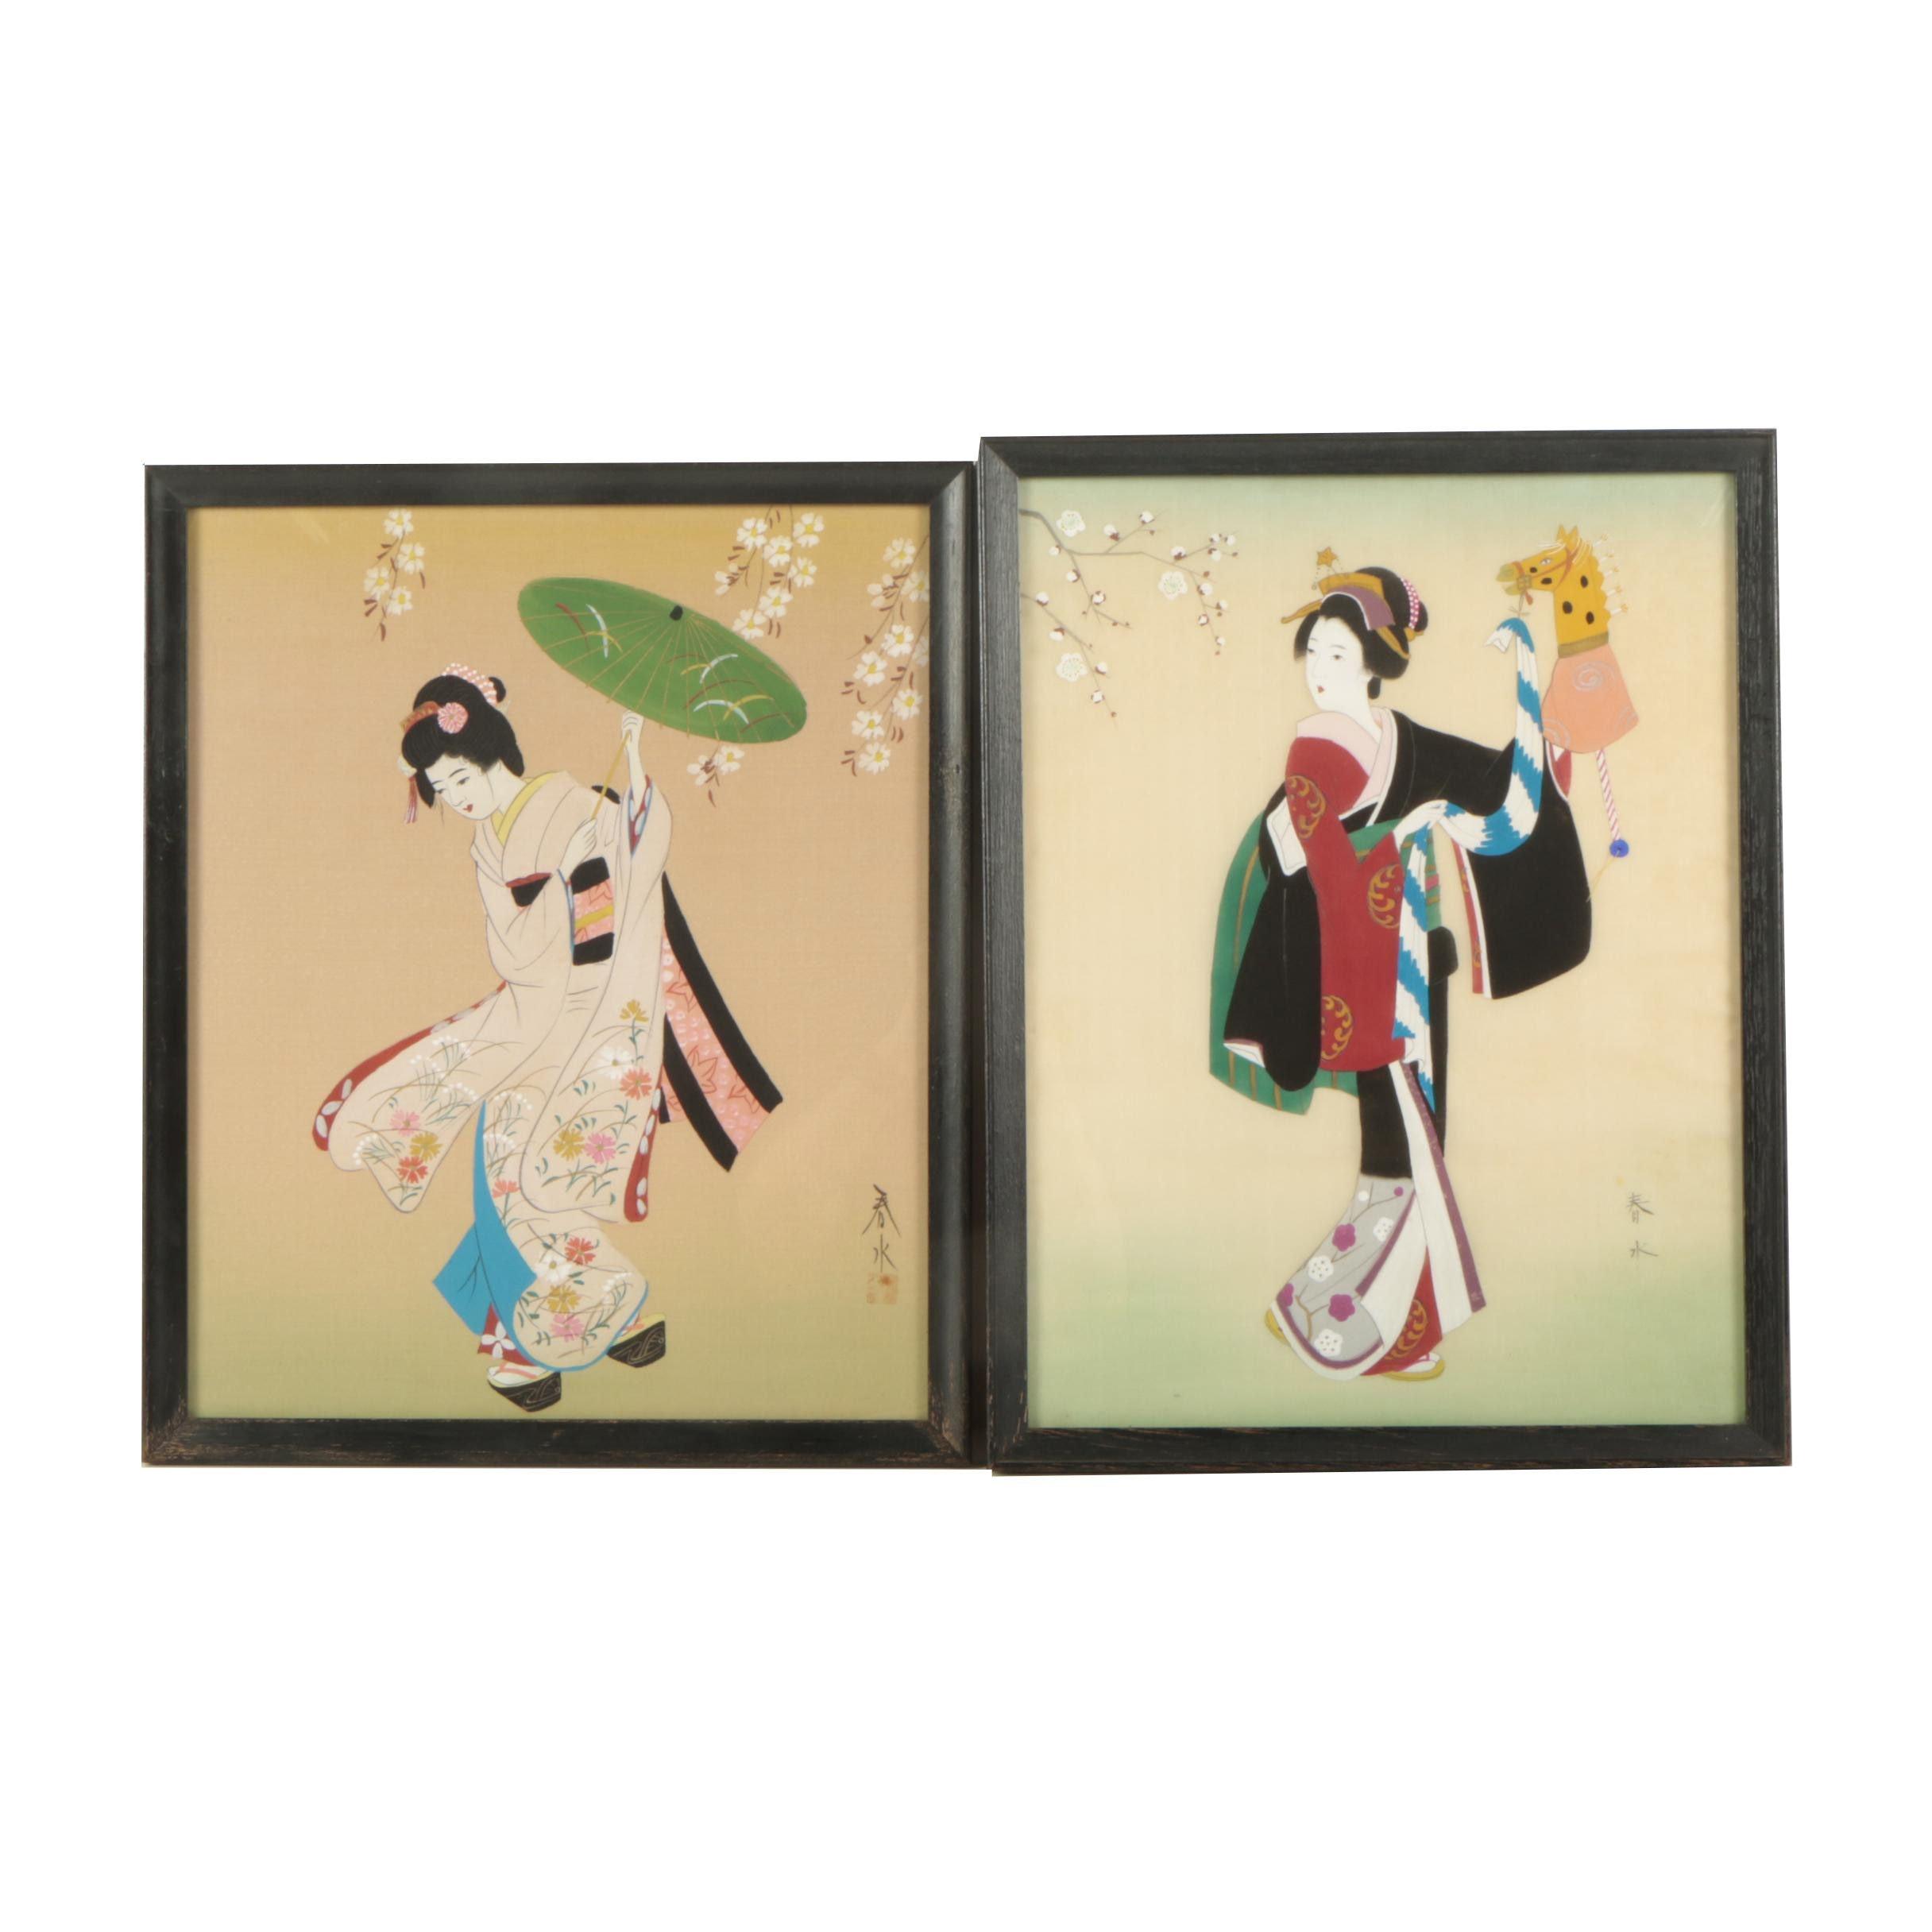 Pair of Japanese Watercolor and Gouache Paintings of Elegant Women